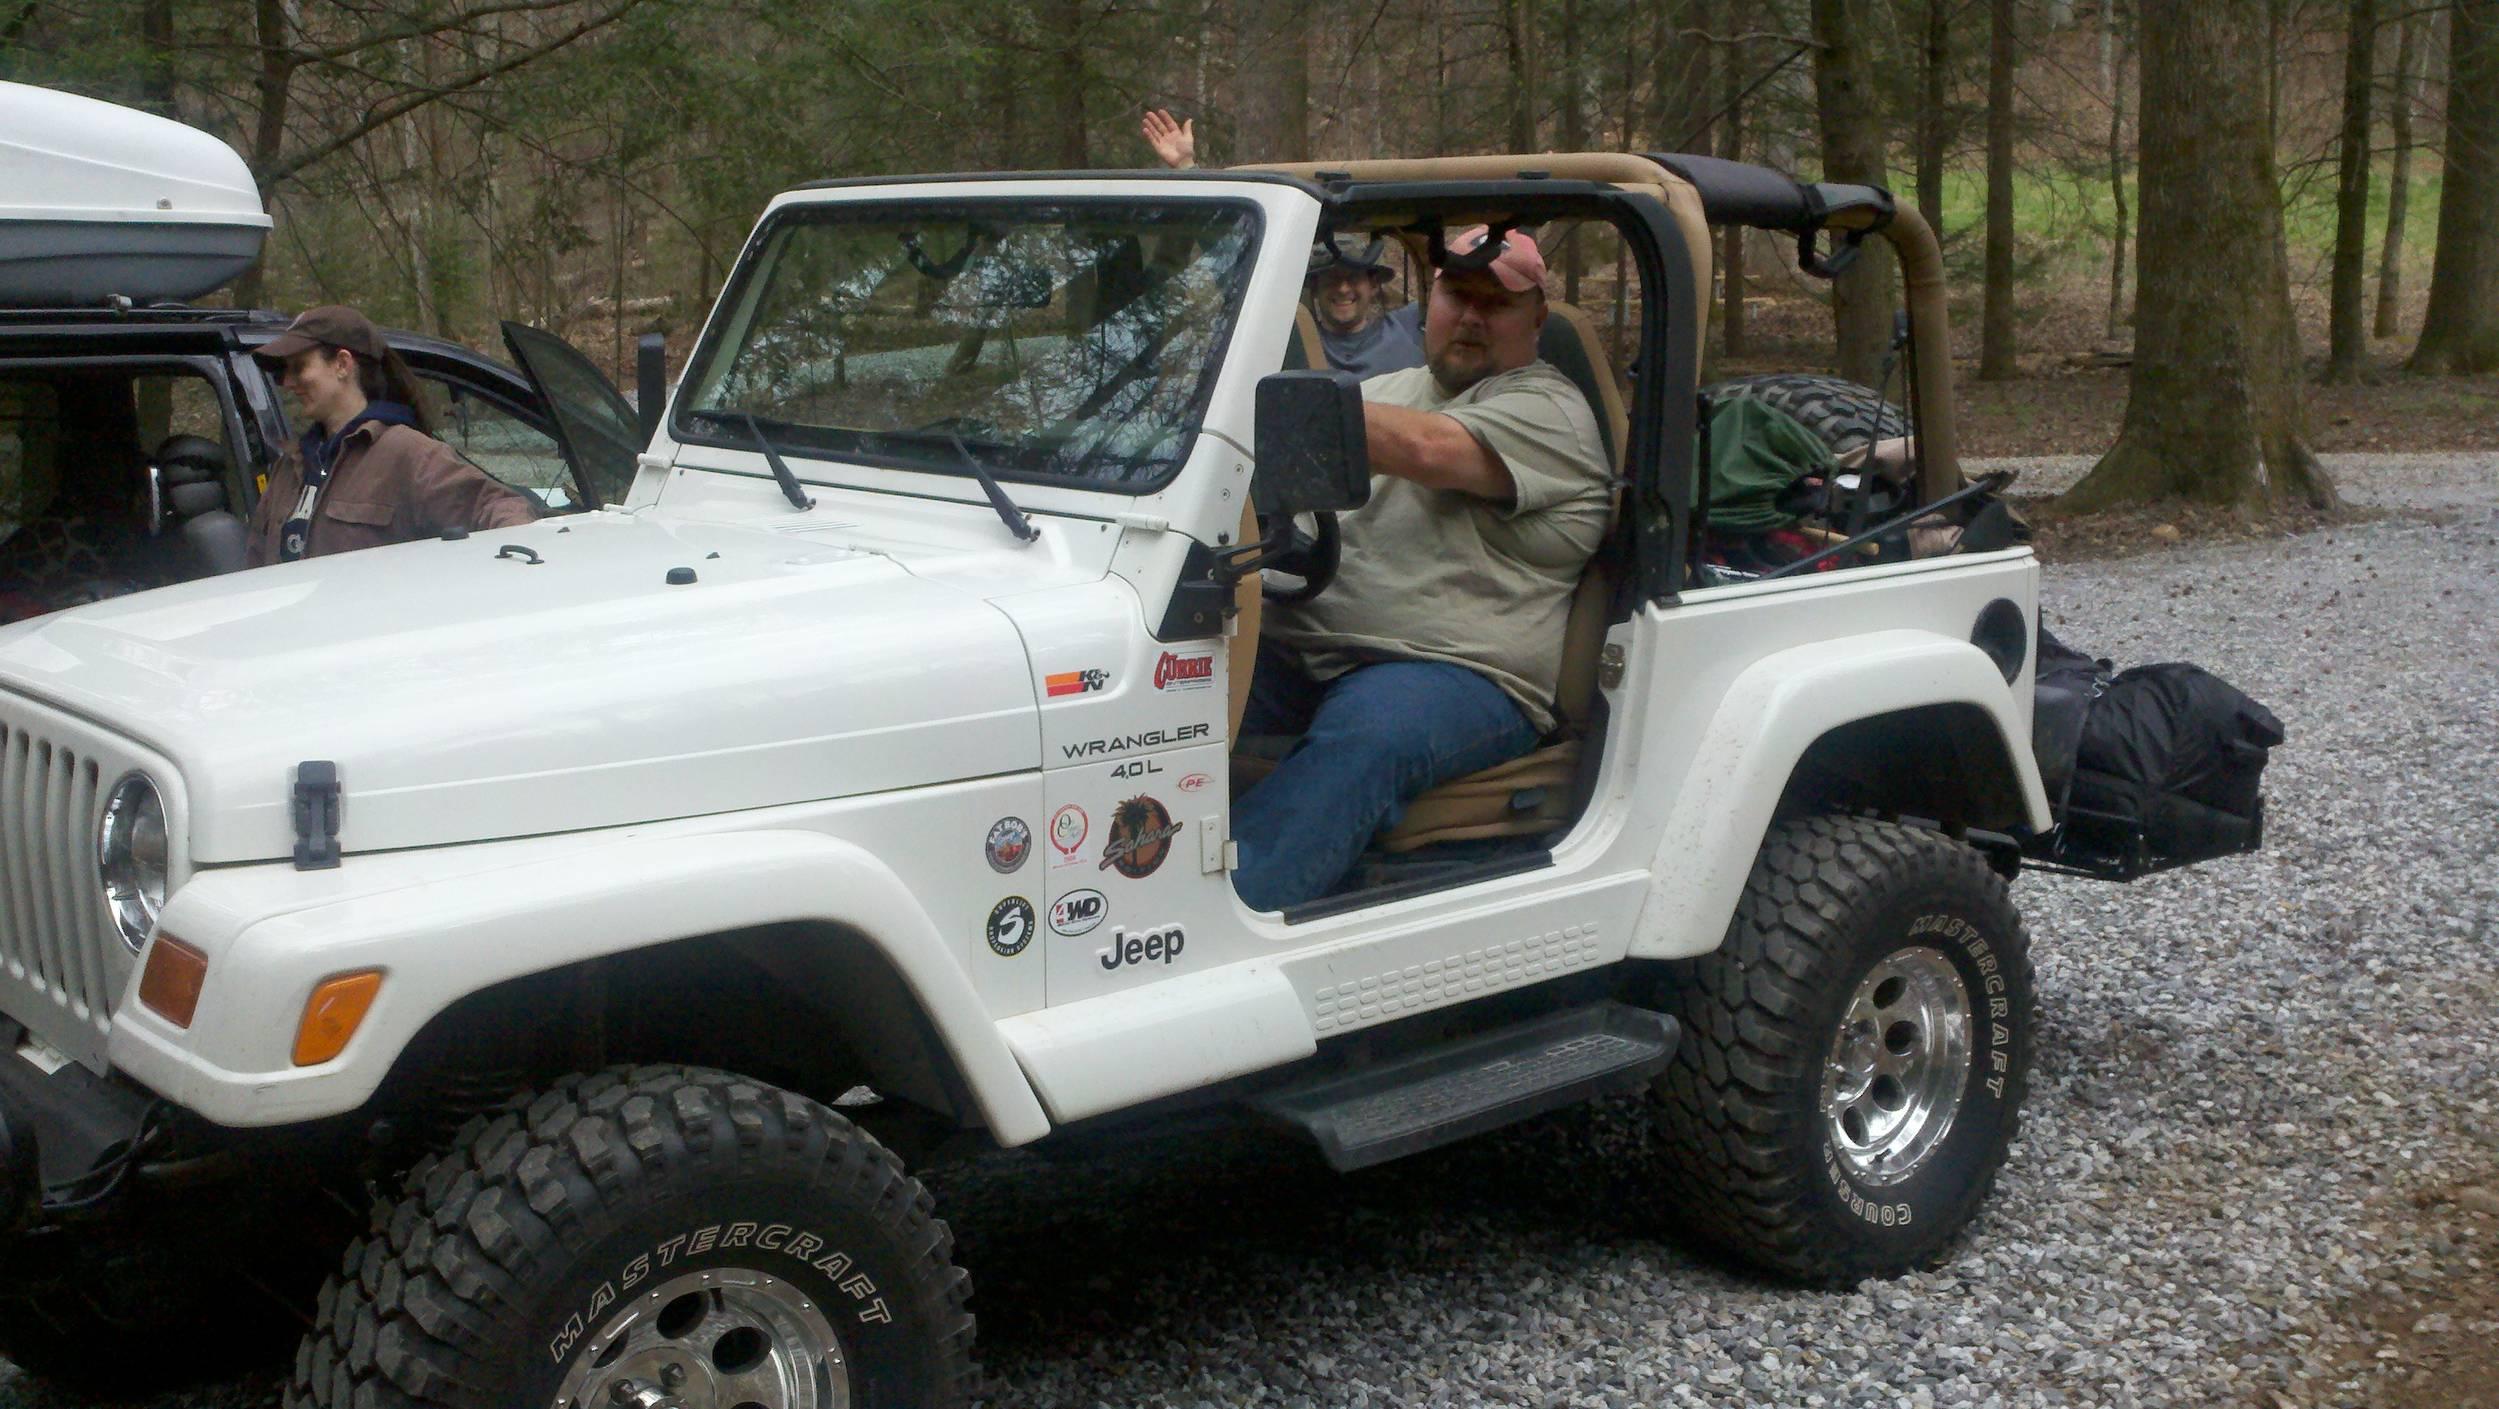 jeep_camping2.jpg